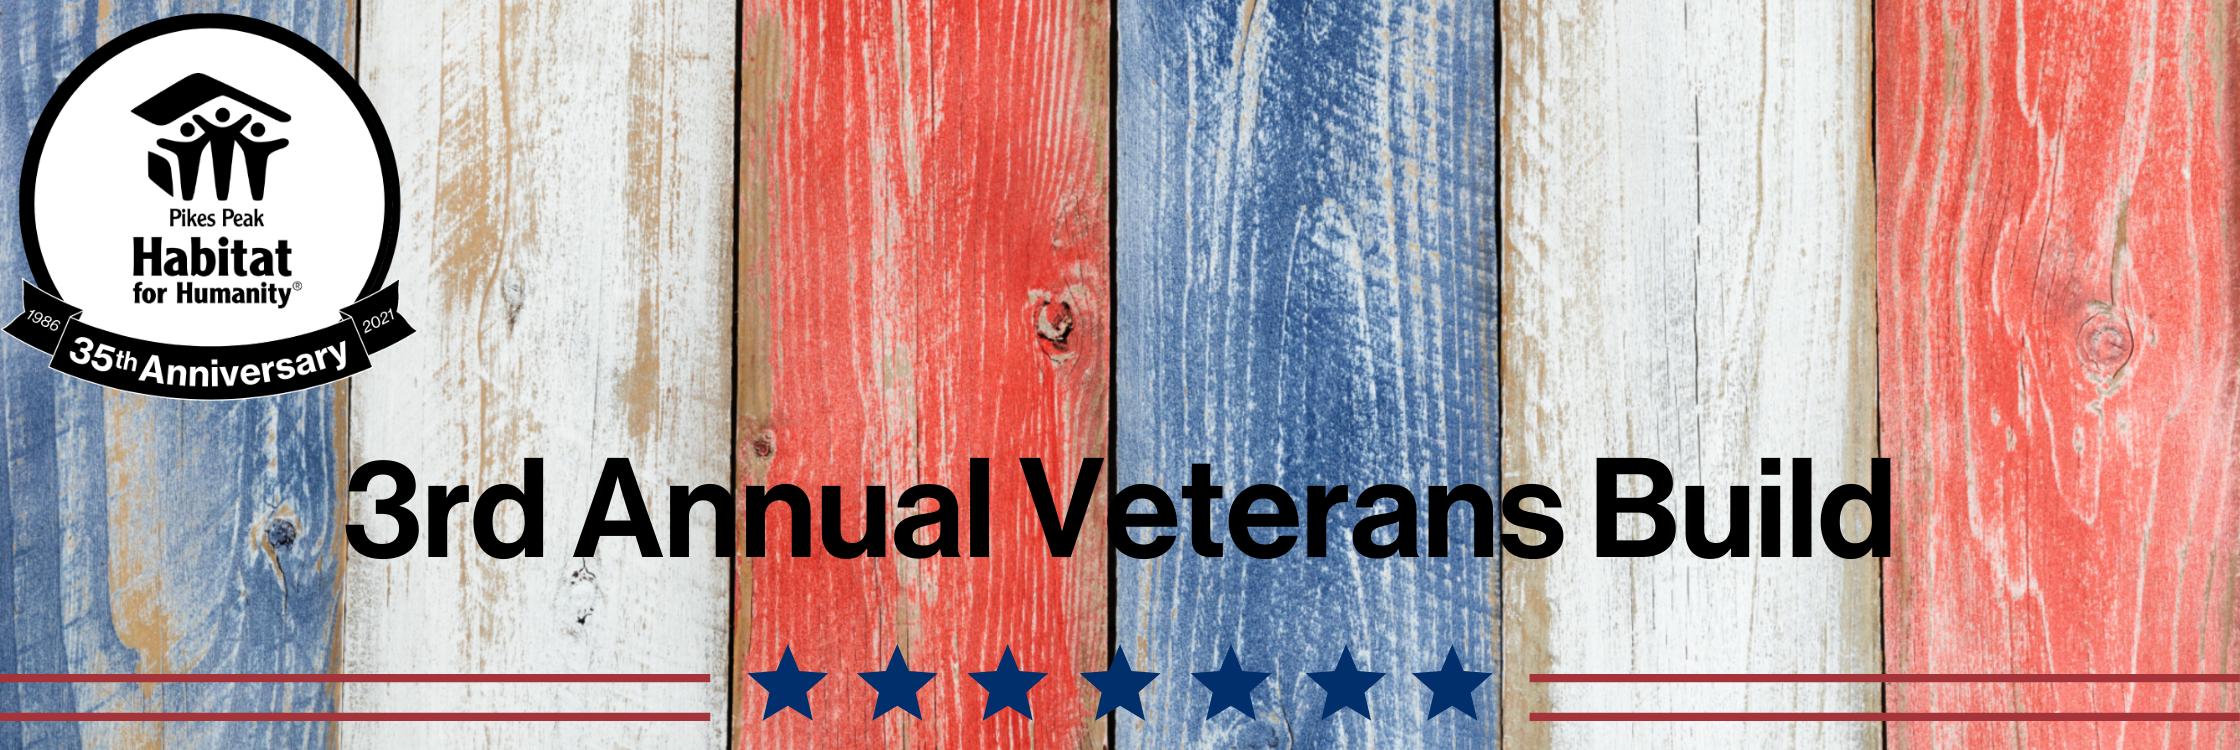 3rd Annual Veterans Build Web Banner